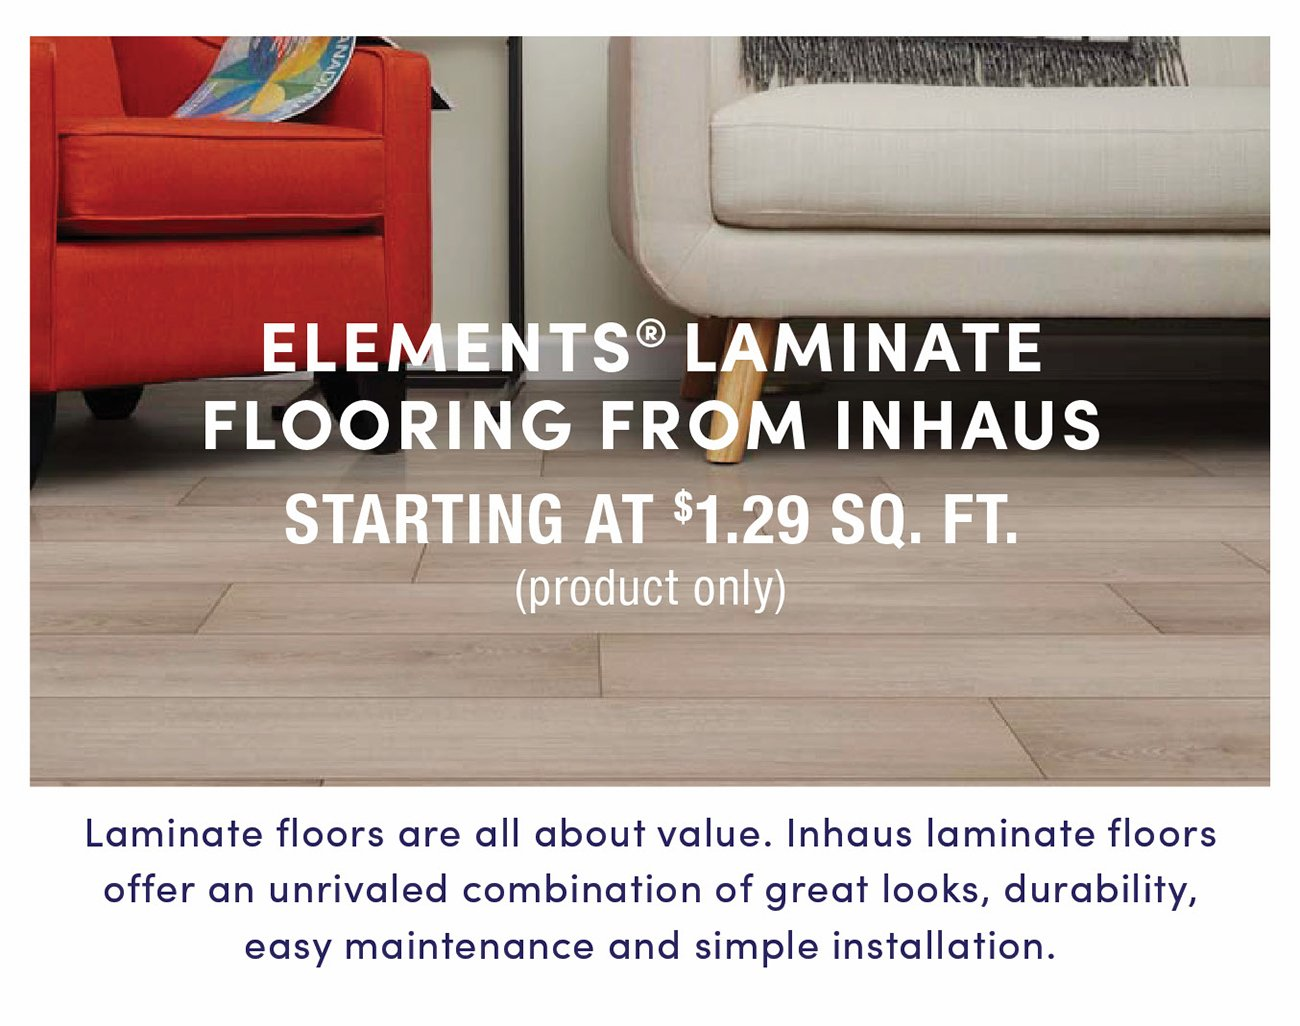 Elements-laminate-flooring